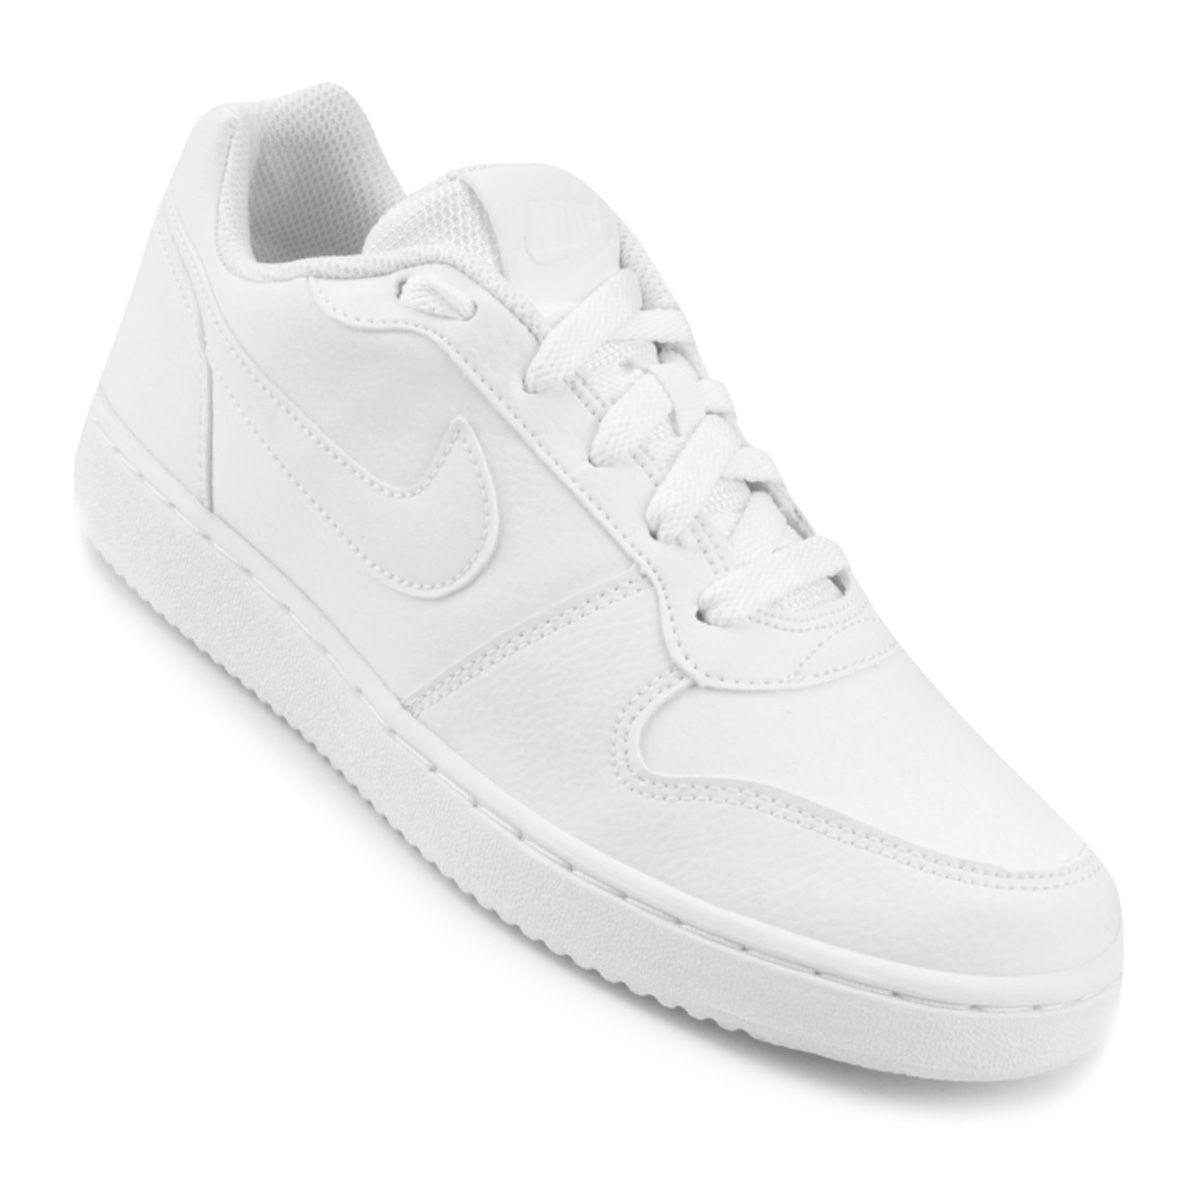 Tênis Nike Ebernon Low Feminino  85877fc6518a0